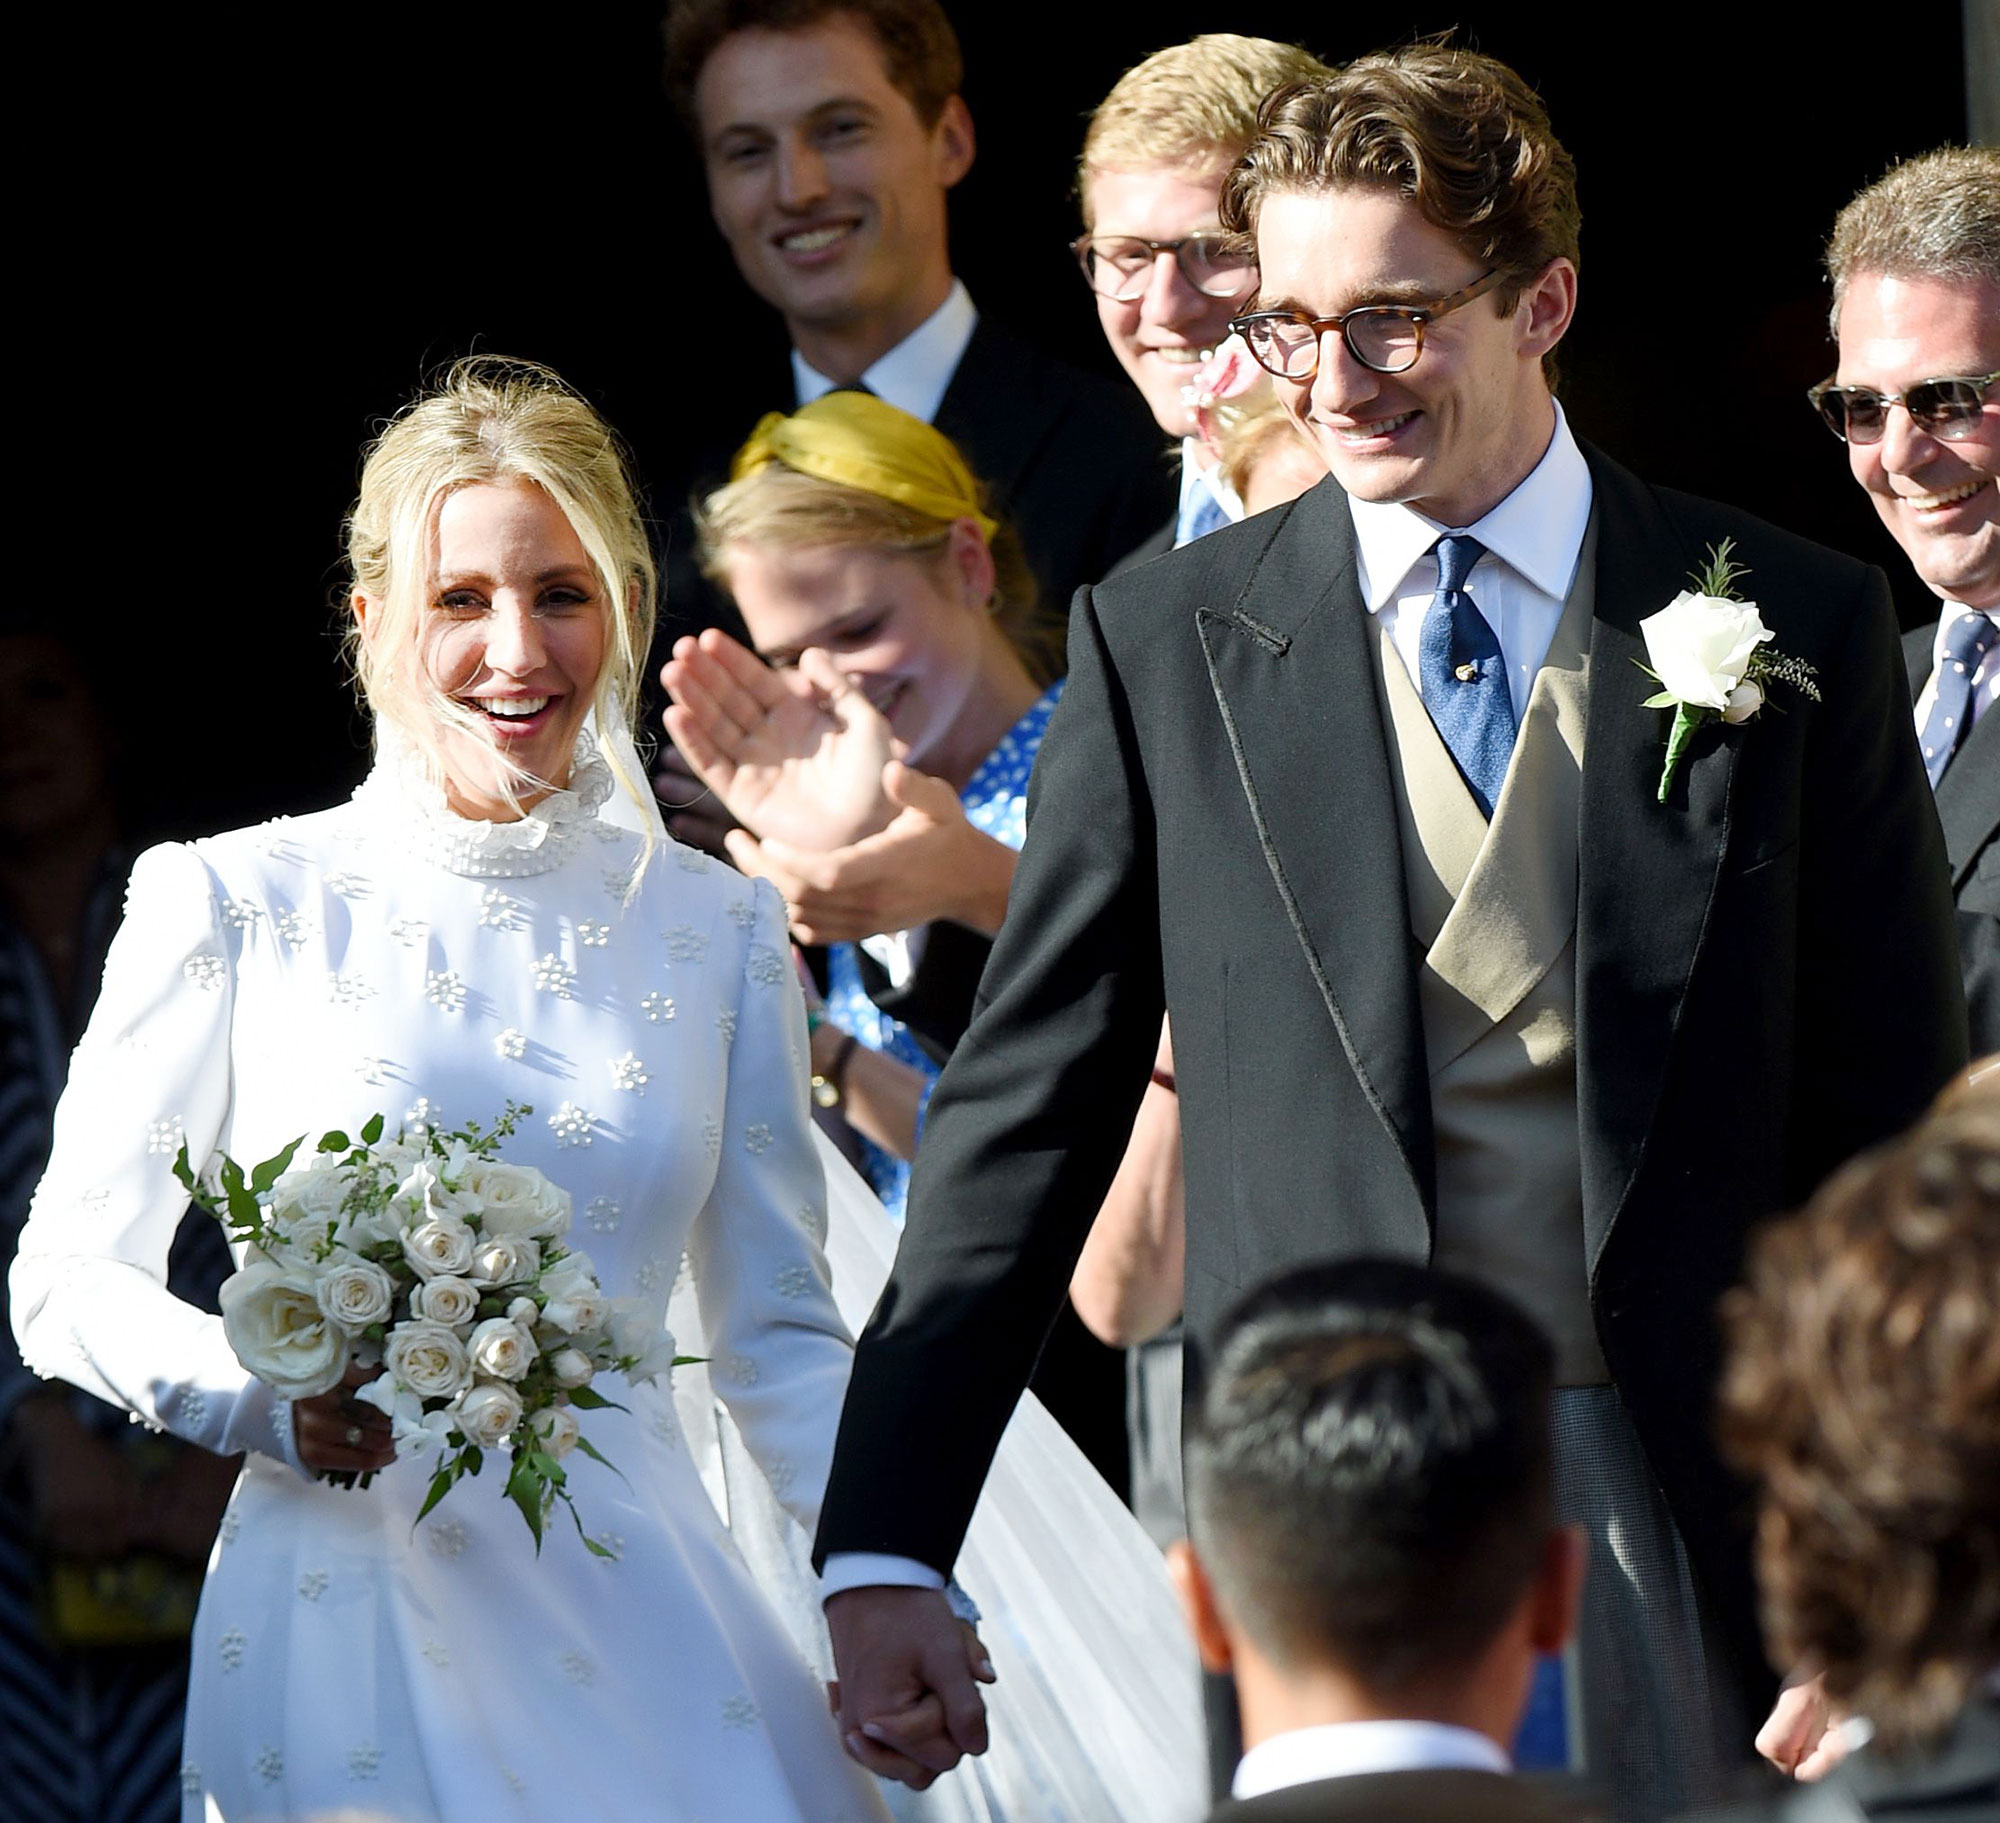 Ellie Goulding Gives Birth and Welcomes First Child With Husband Caspar Jopling